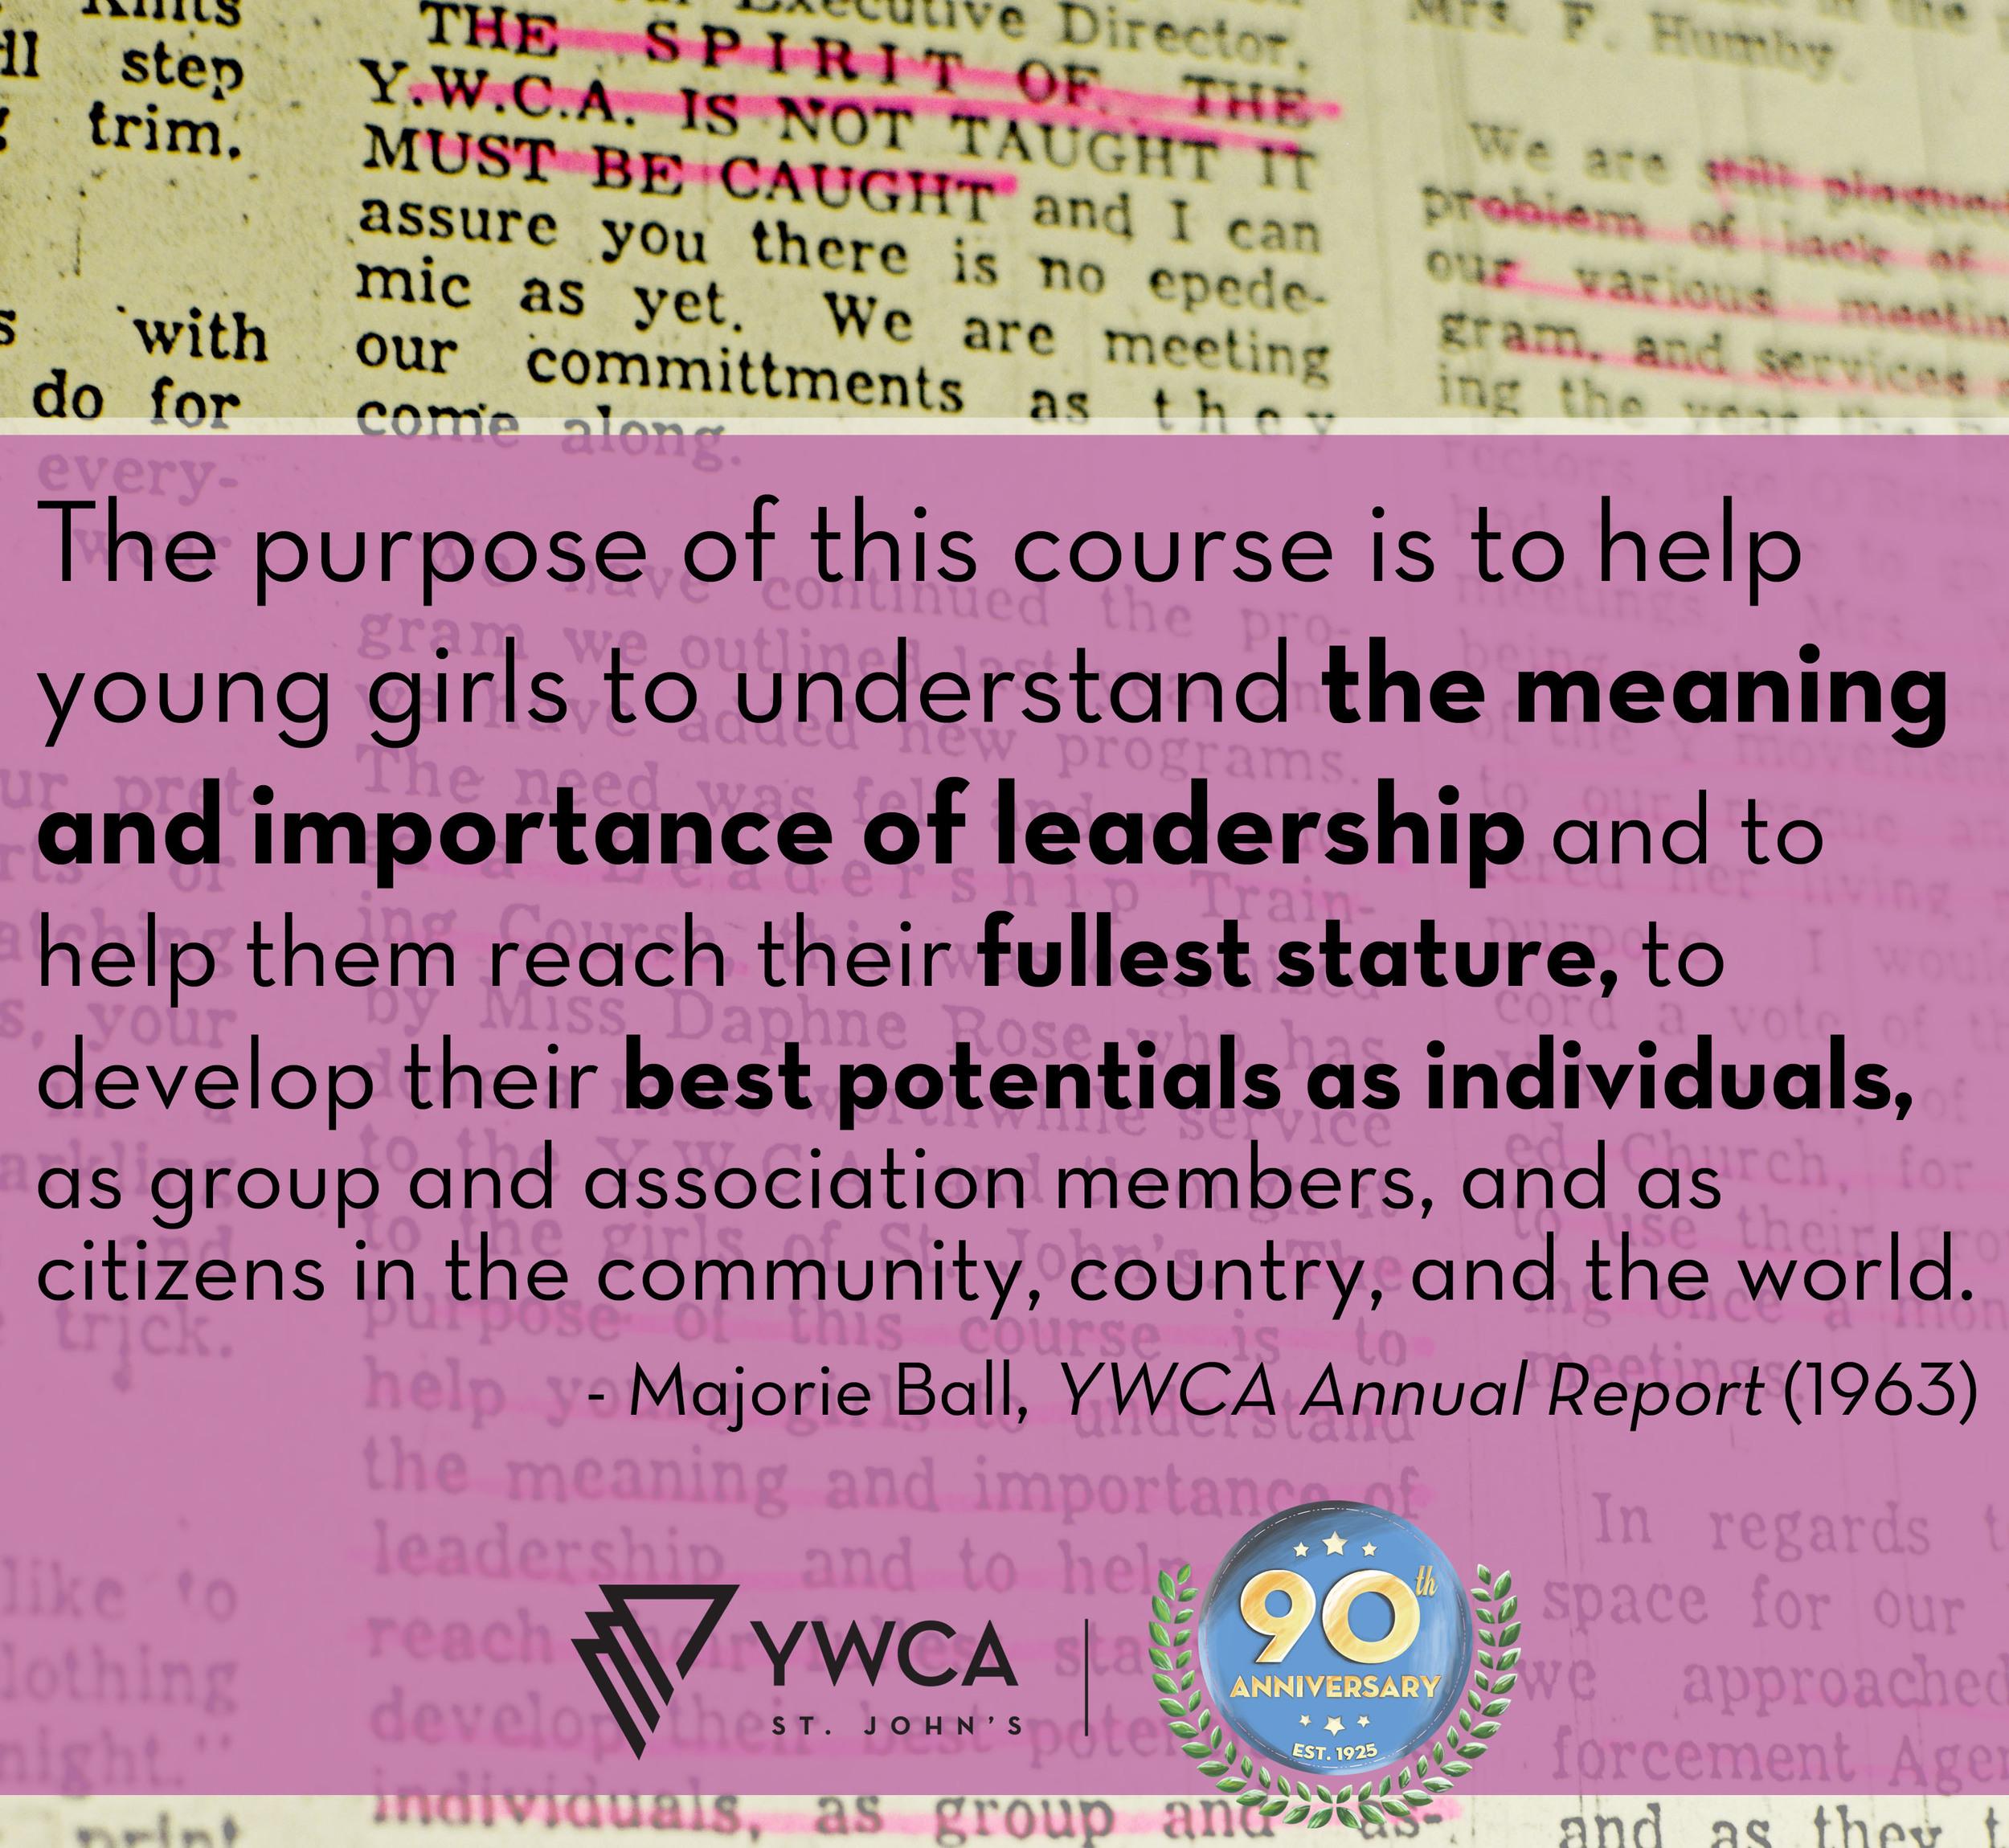 1963 Leadership Program - Marjorie Ball Quote.jpg